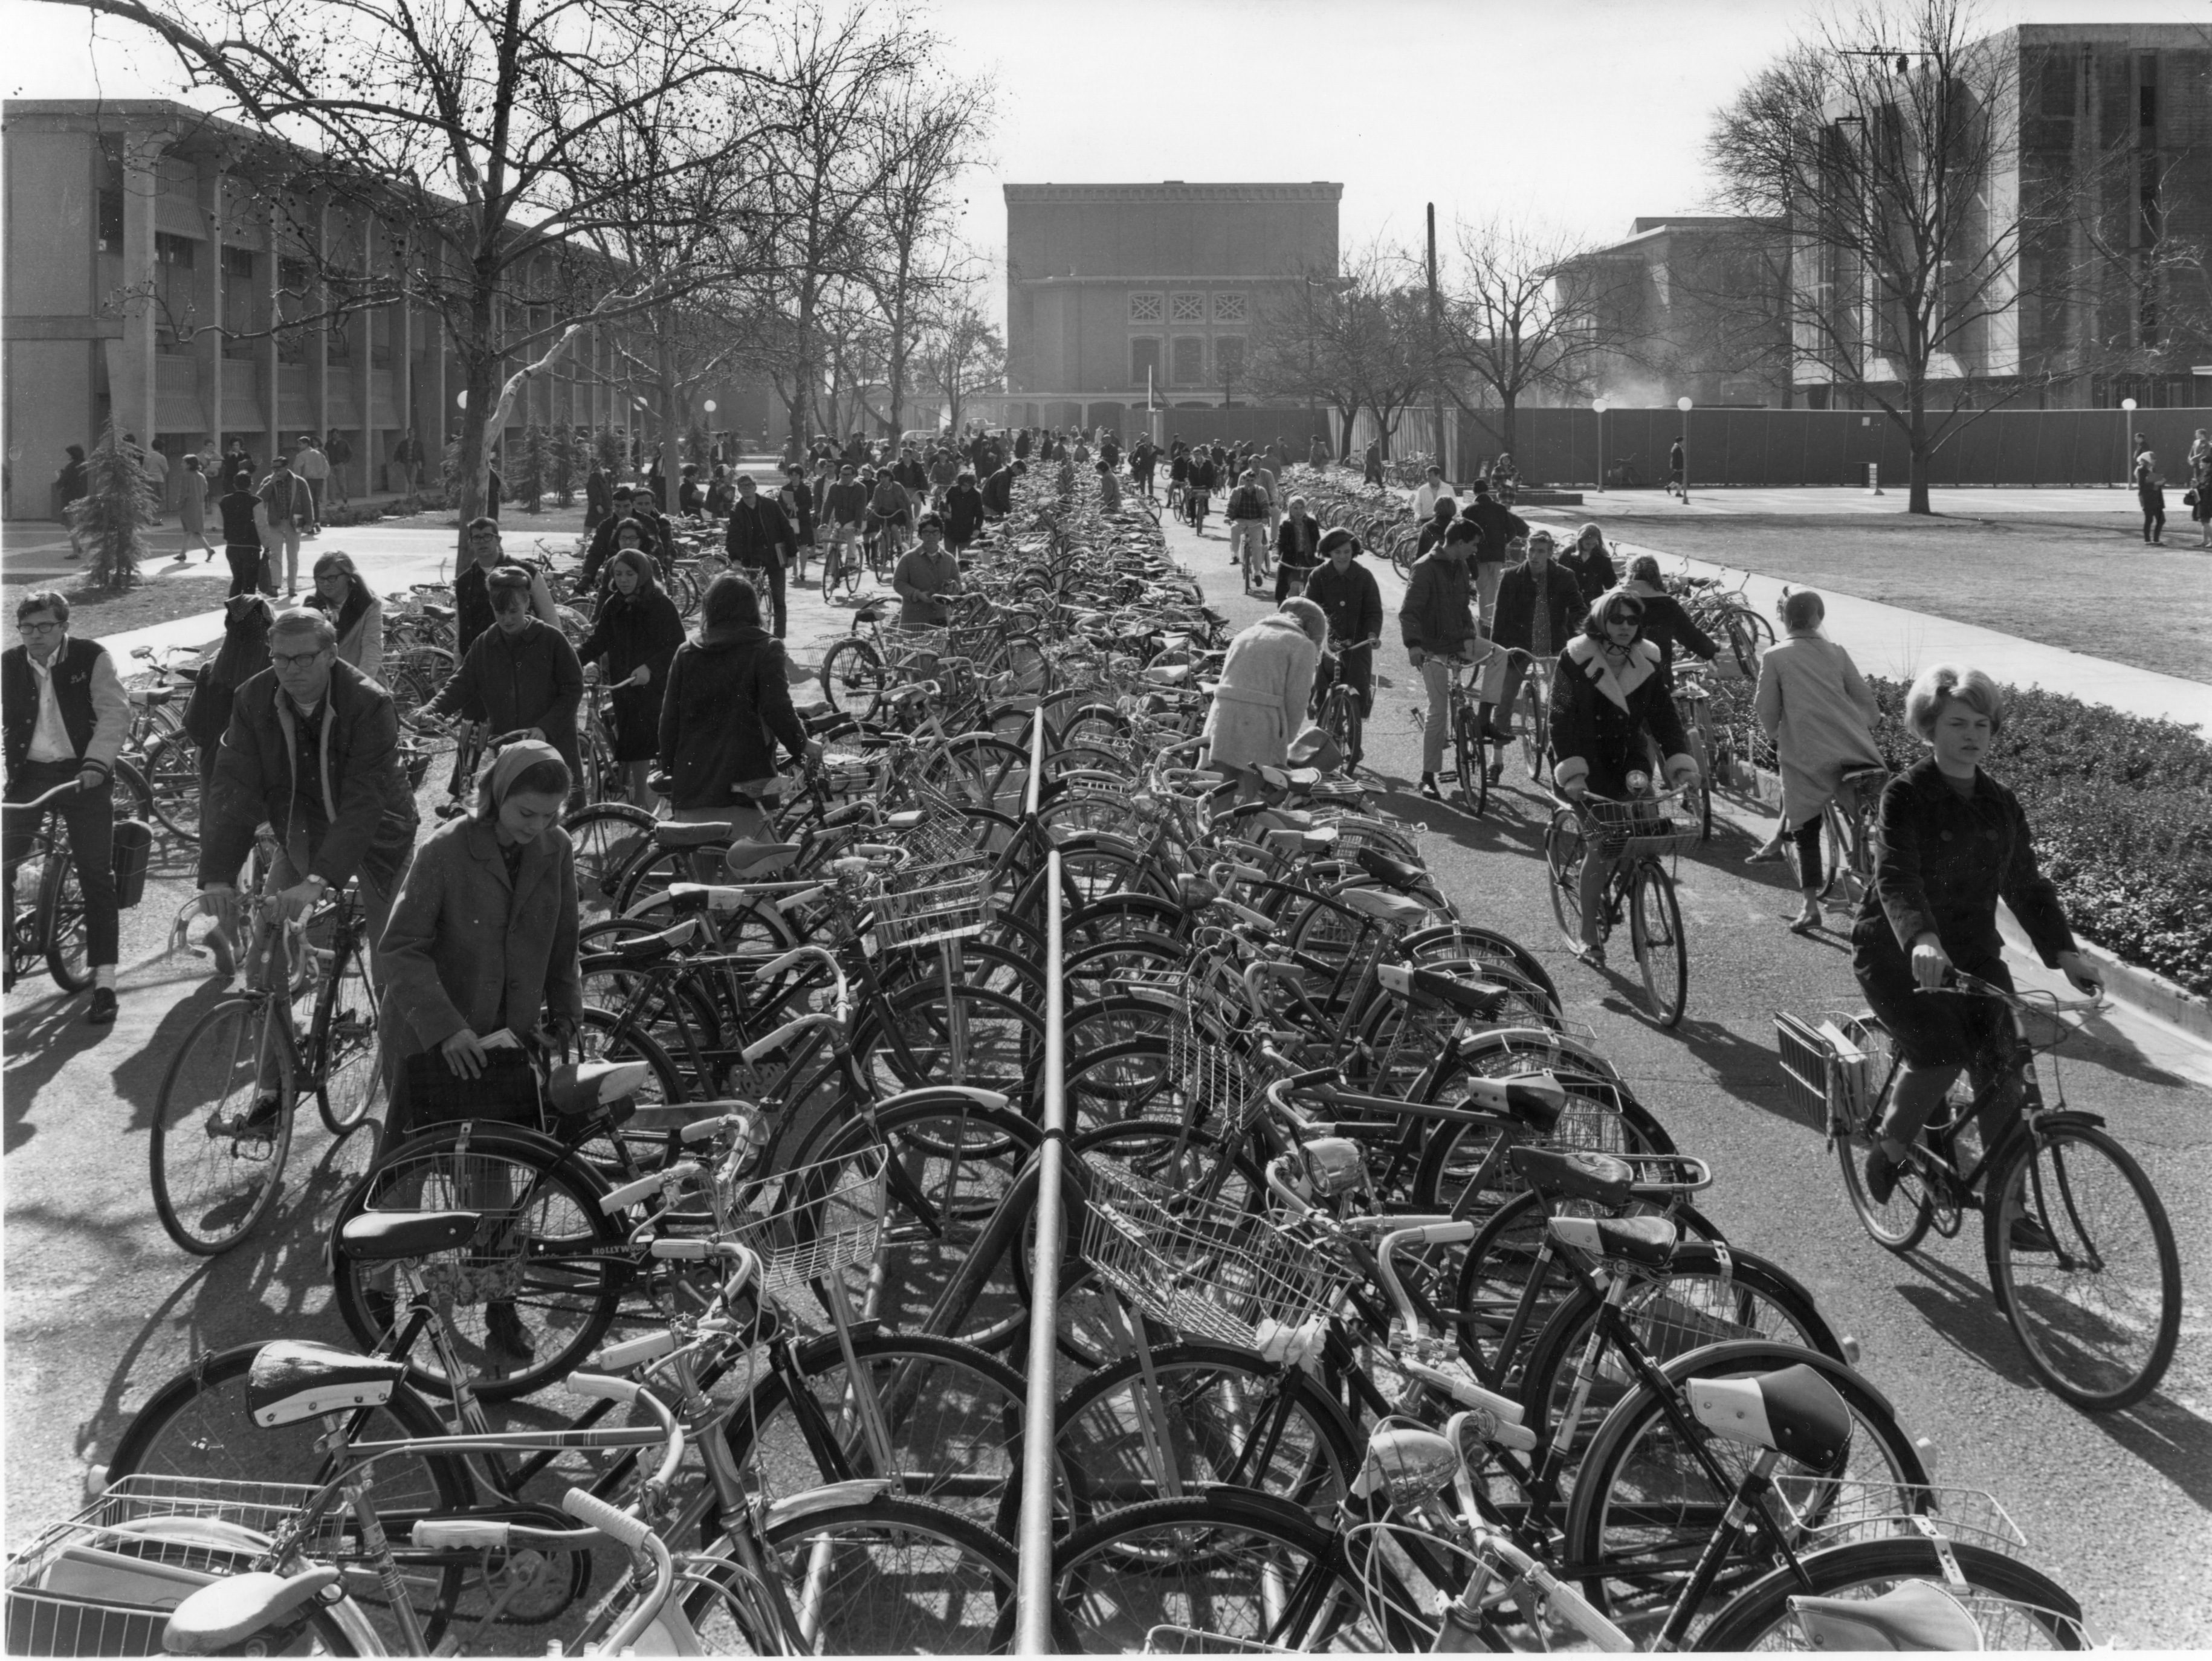 a118ef91a78 (See   https   bicyclesafetyinstitutedotorg3.files.wordpress.com 2013 05 1966 anseladams.jpg  )